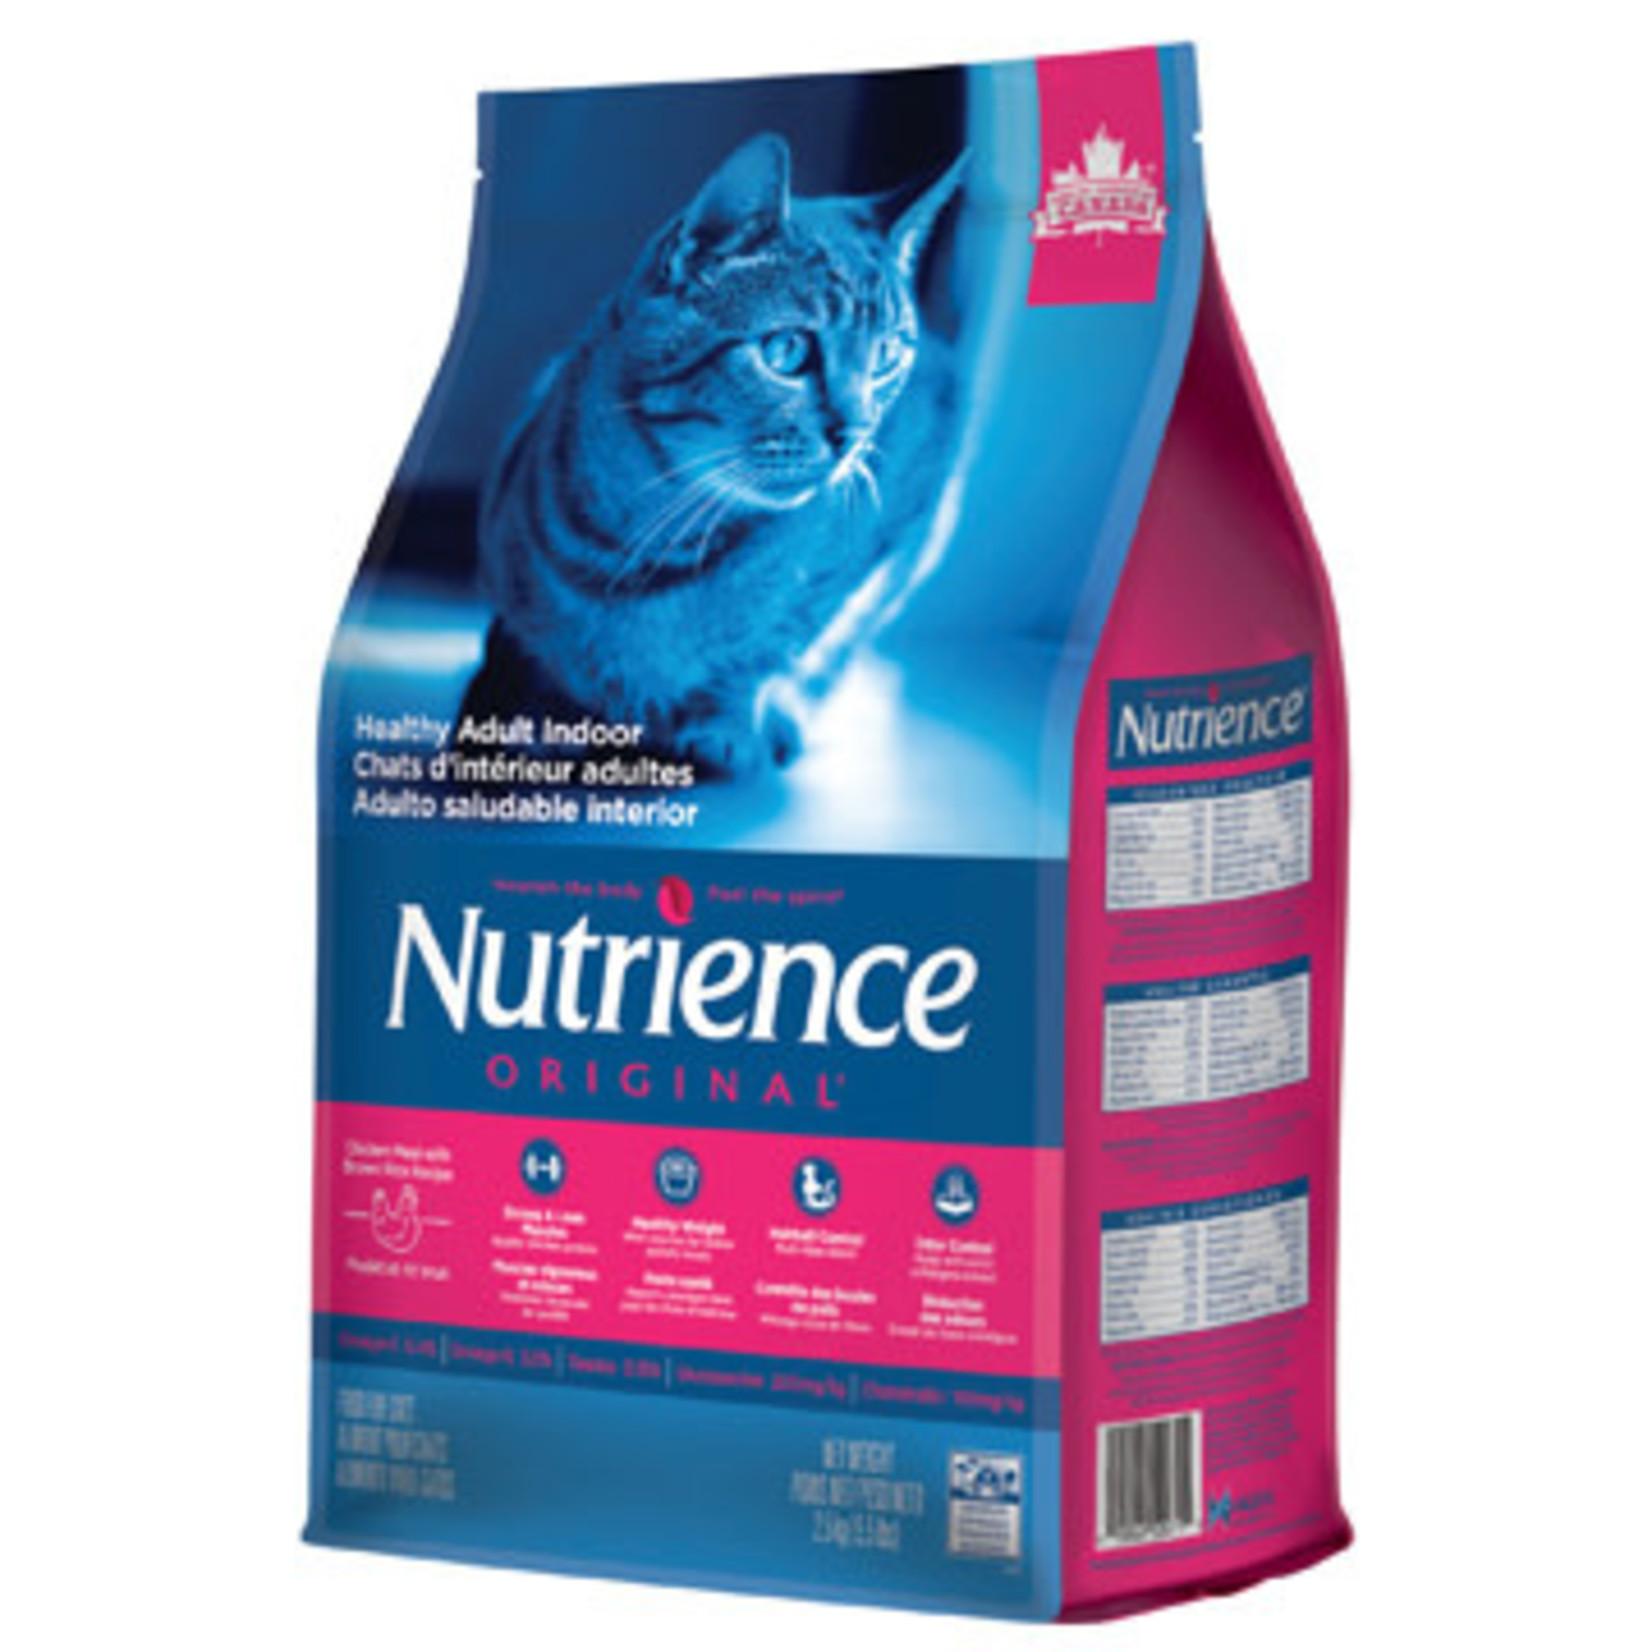 Nutrience Original Indoor Cat 2.5kg